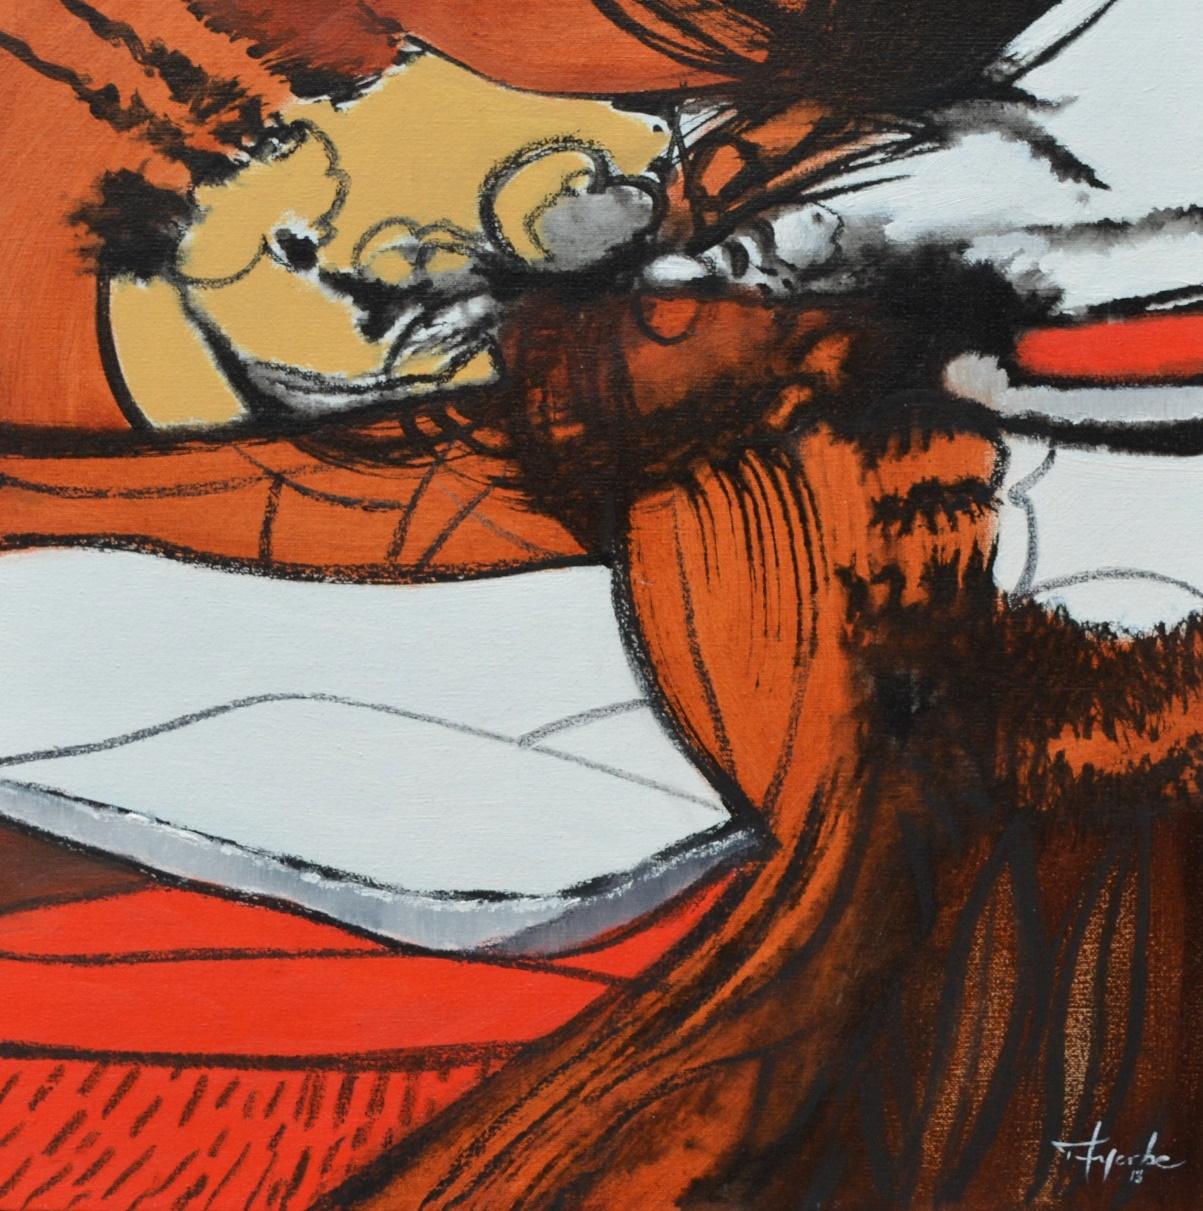 Pintura moderna y fotograf a art stica pintores for Imagenes de cuadros abstractos faciles